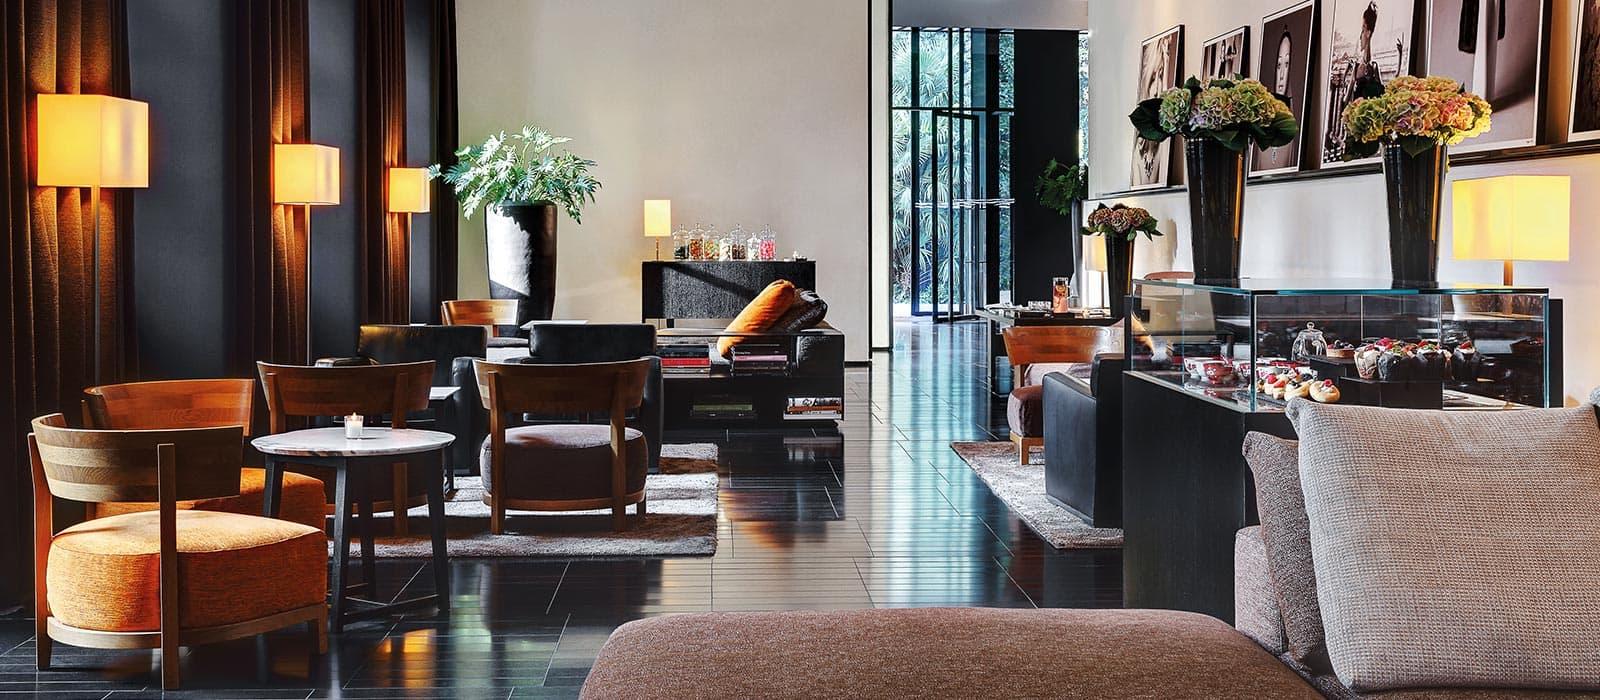 Haute Living - Luxury Hotels from Haute Couture Designers Bulgari Hotel Milan